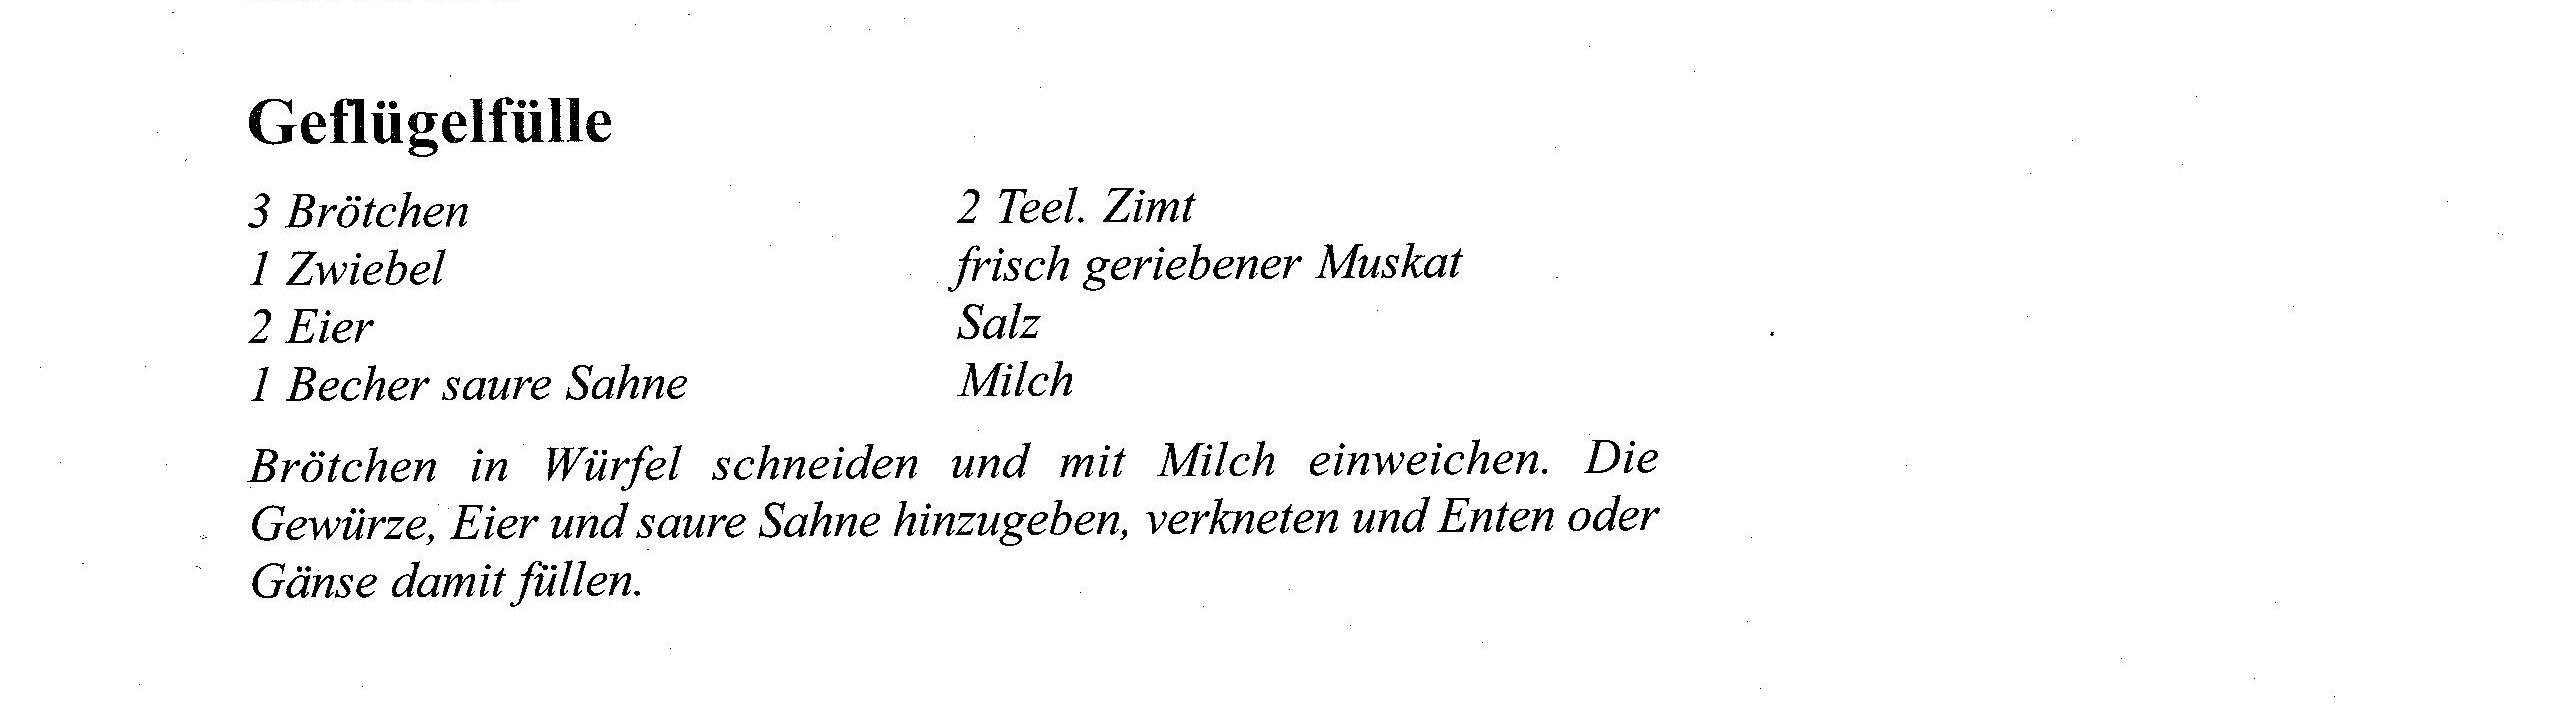 Rezept November Gänsebr. u. Gemüsefülle